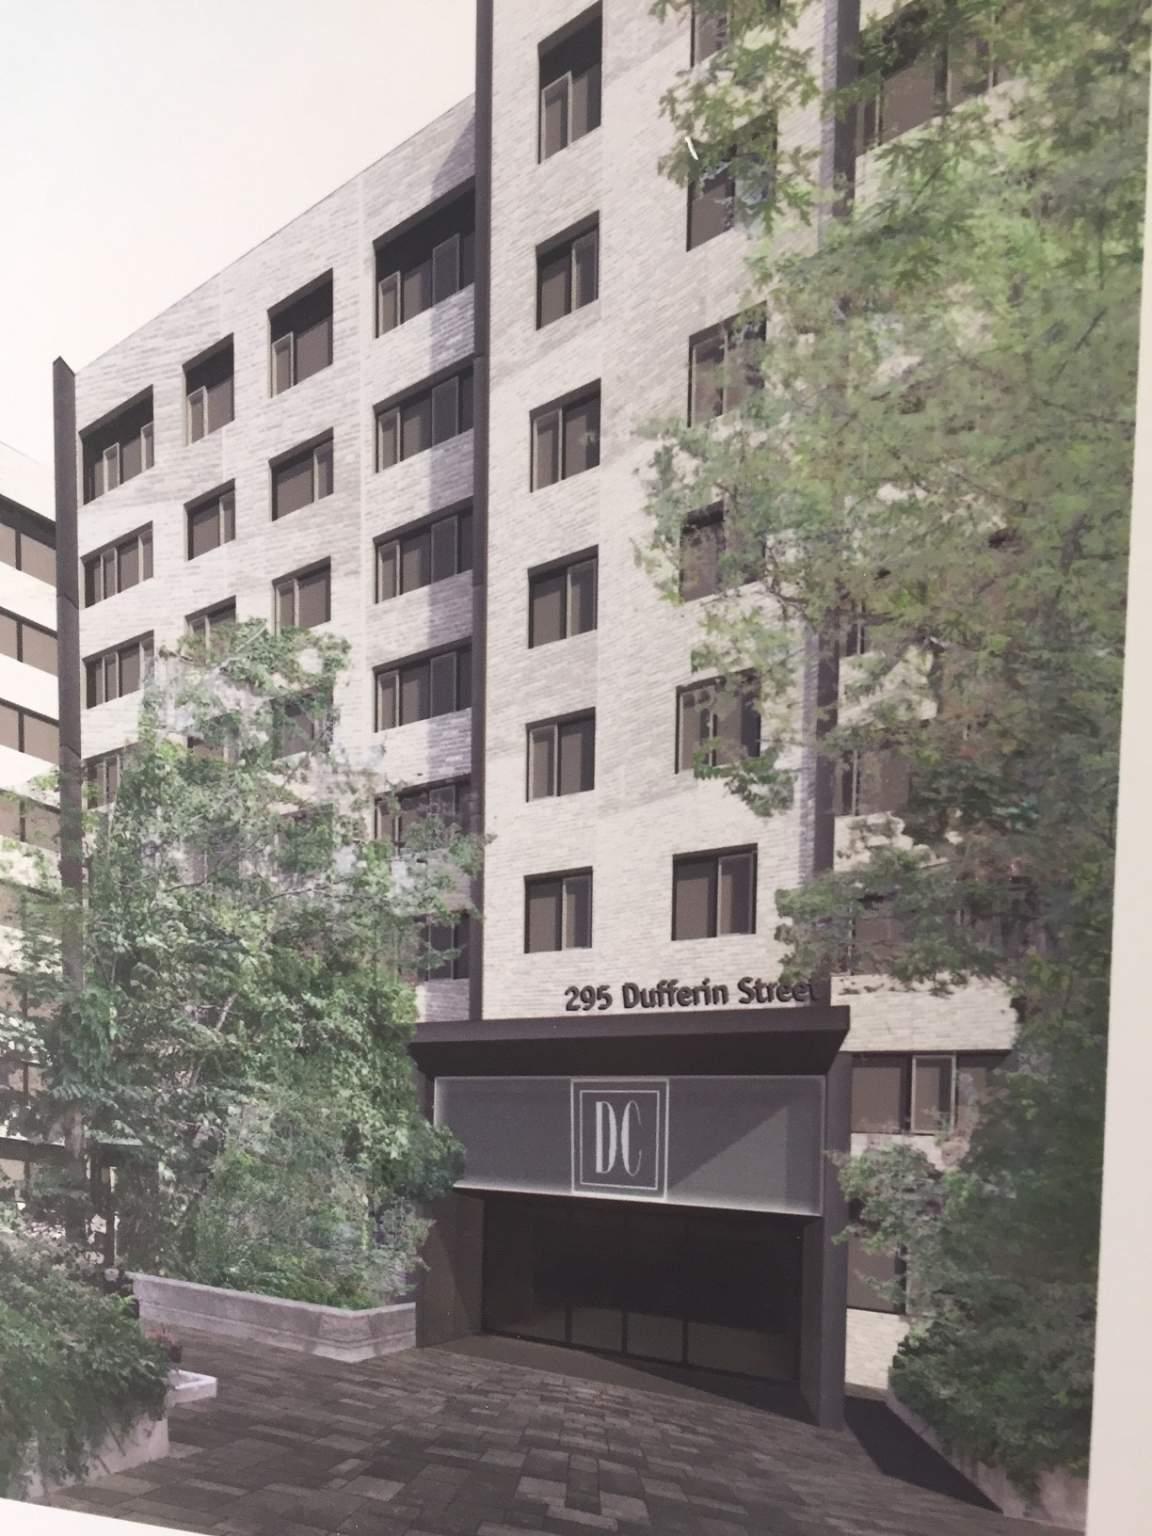 Dufferin Crossing Apartments photo #1